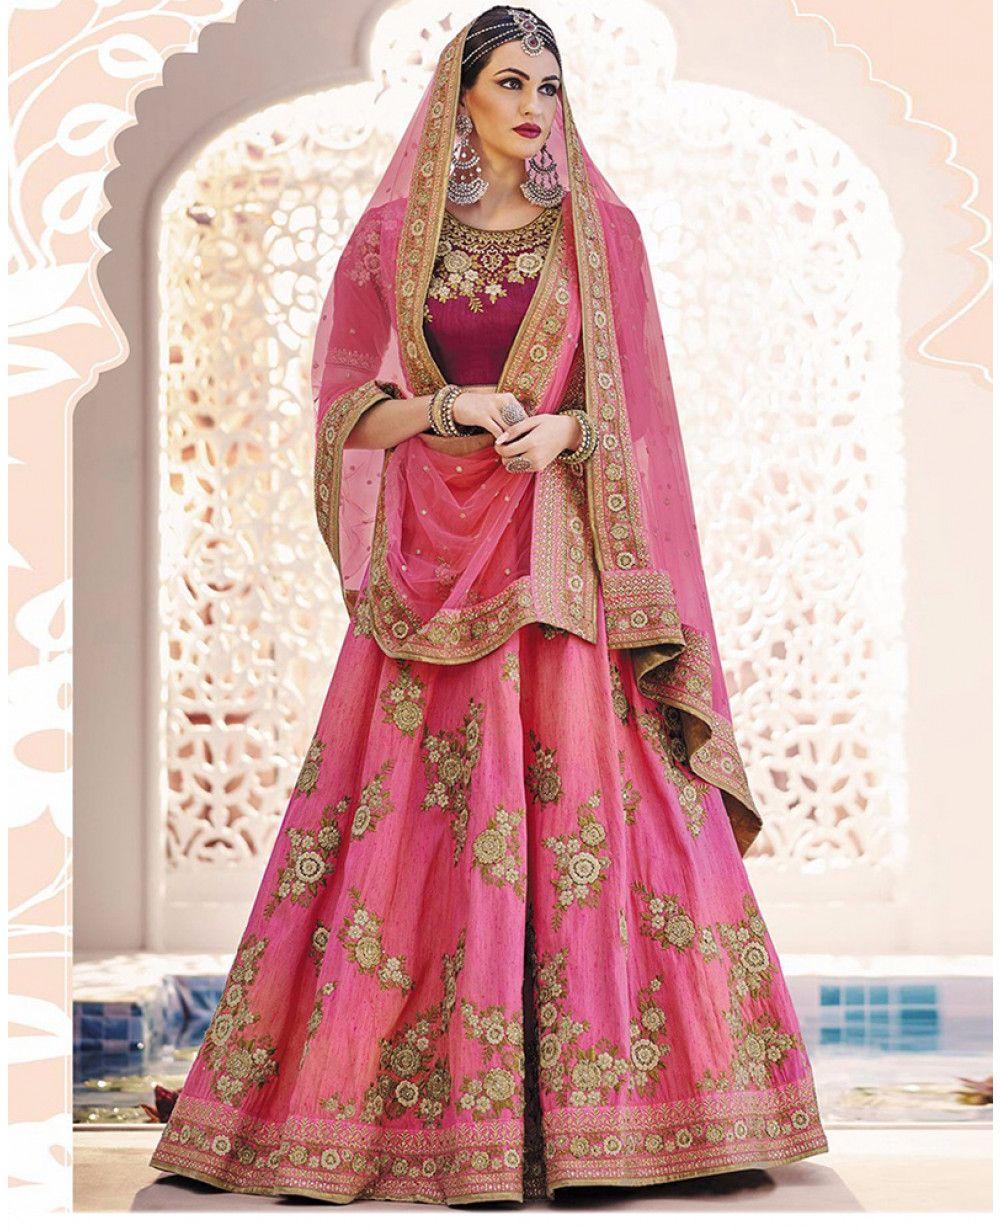 dc83f378df Colour Trendz Pink Hand Work Bridal Wedding Ware #Lehenga Choli ...